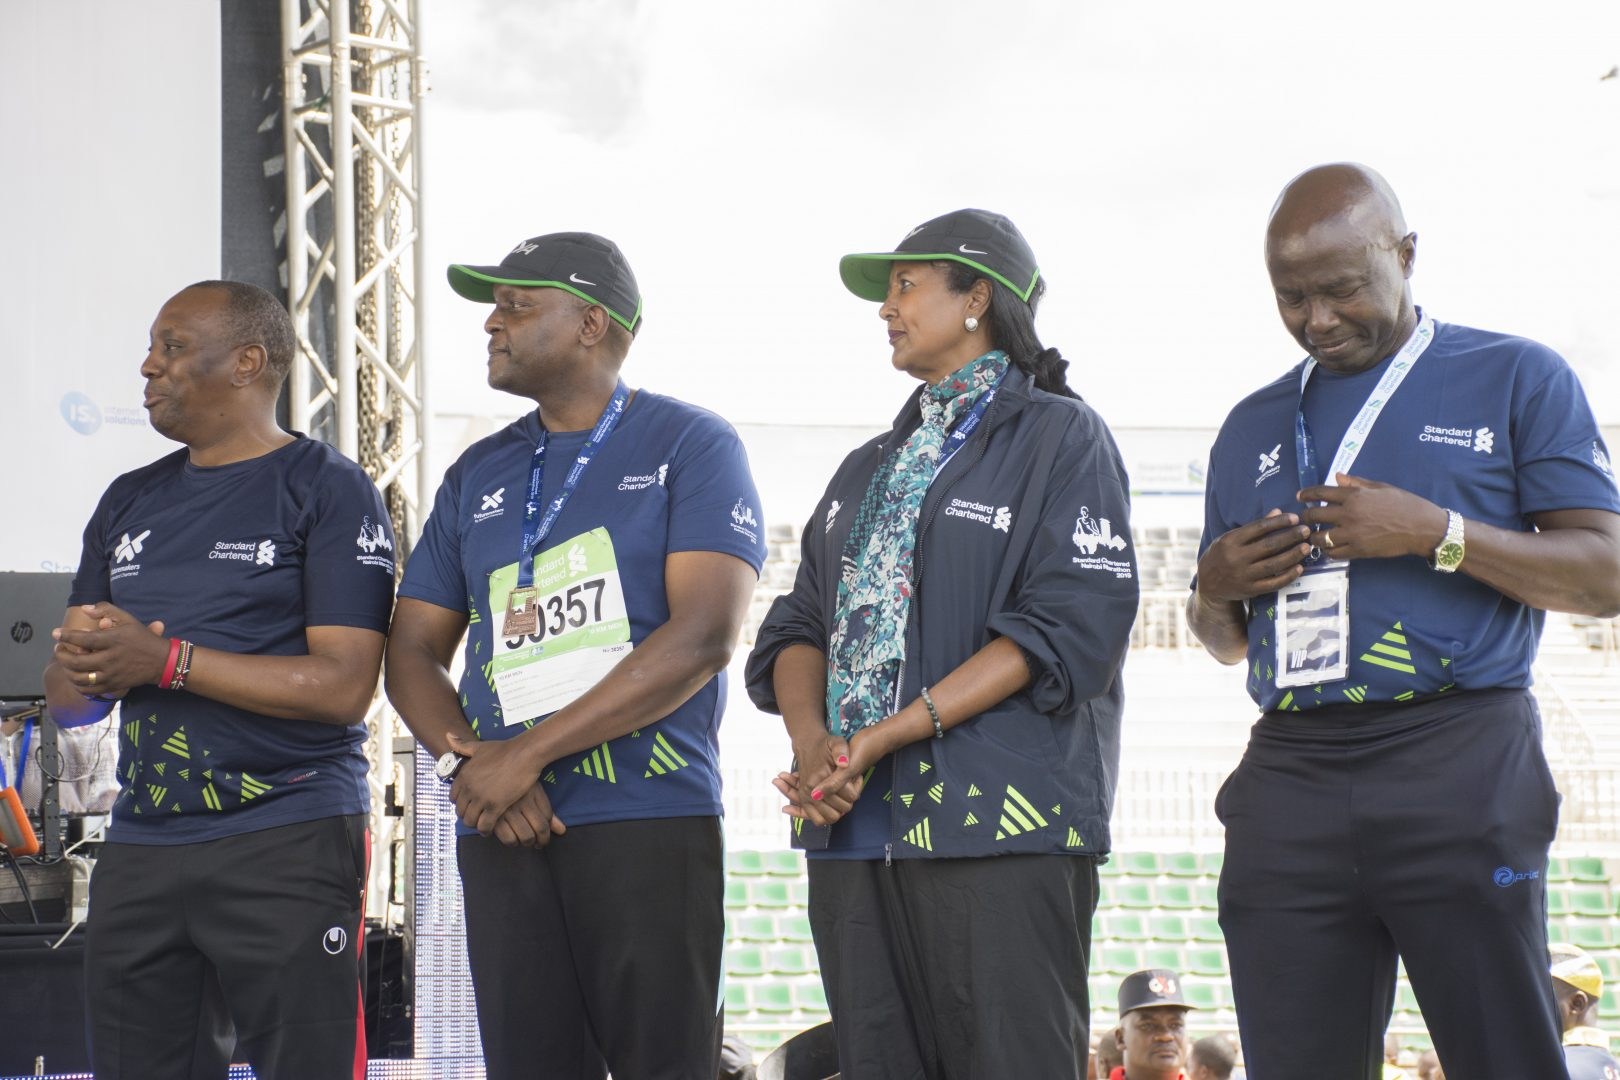 https://www.nairobimarathon.com/wp-content/uploads/2021/07/DSC_3253.jpg